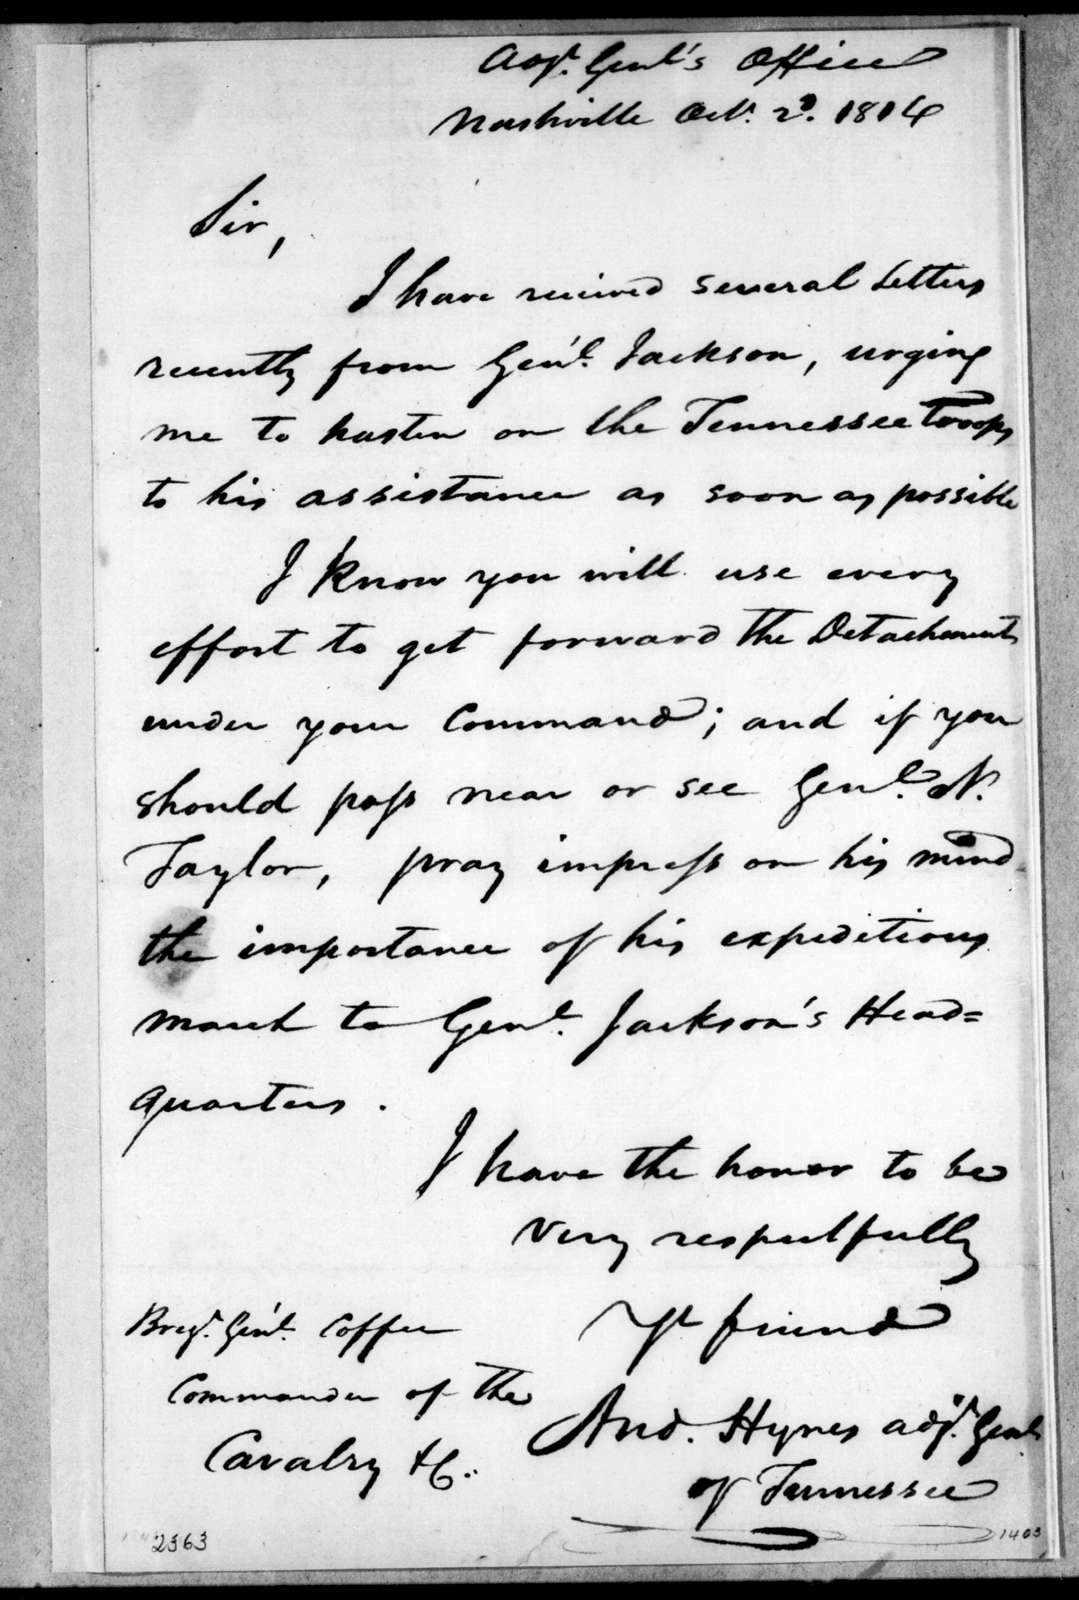 Andrew Hynes to John Coffee, October 2, 1814